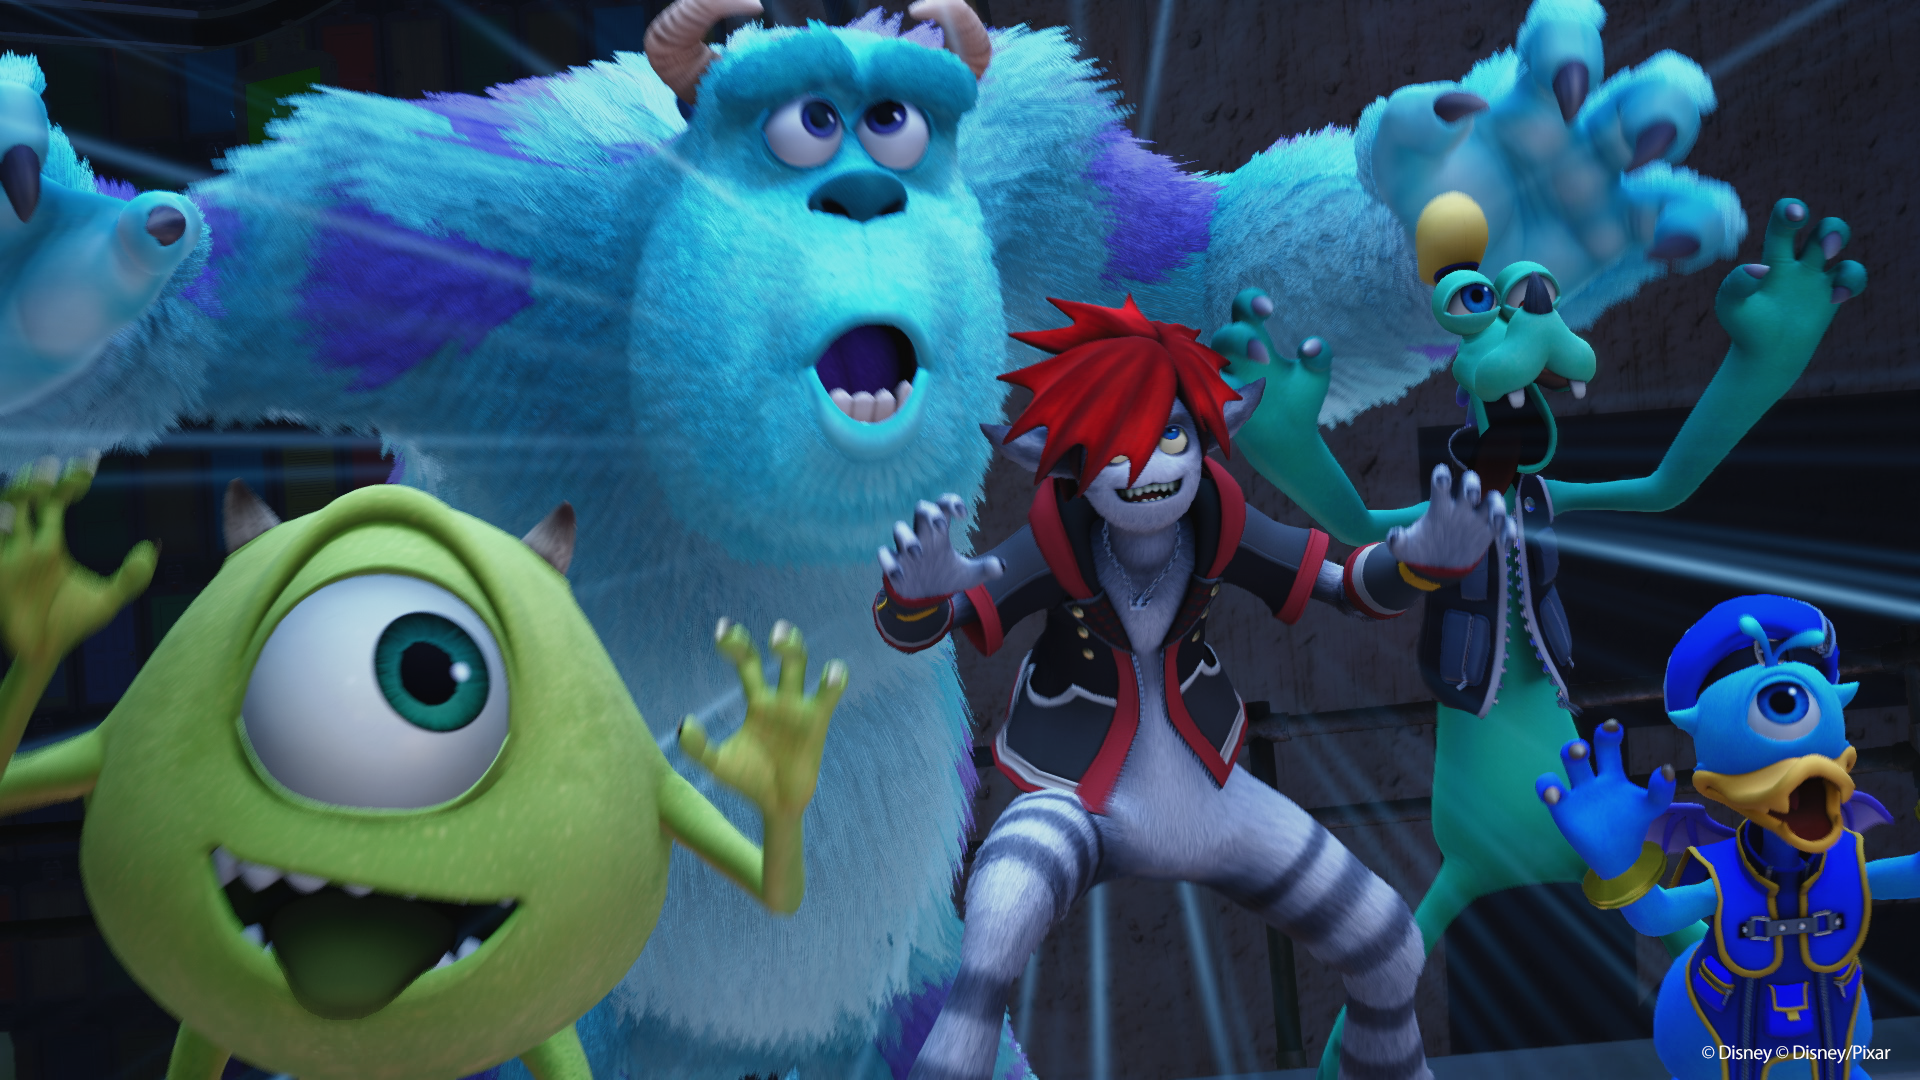 Kingdom Hearts 3 Monsters Inc